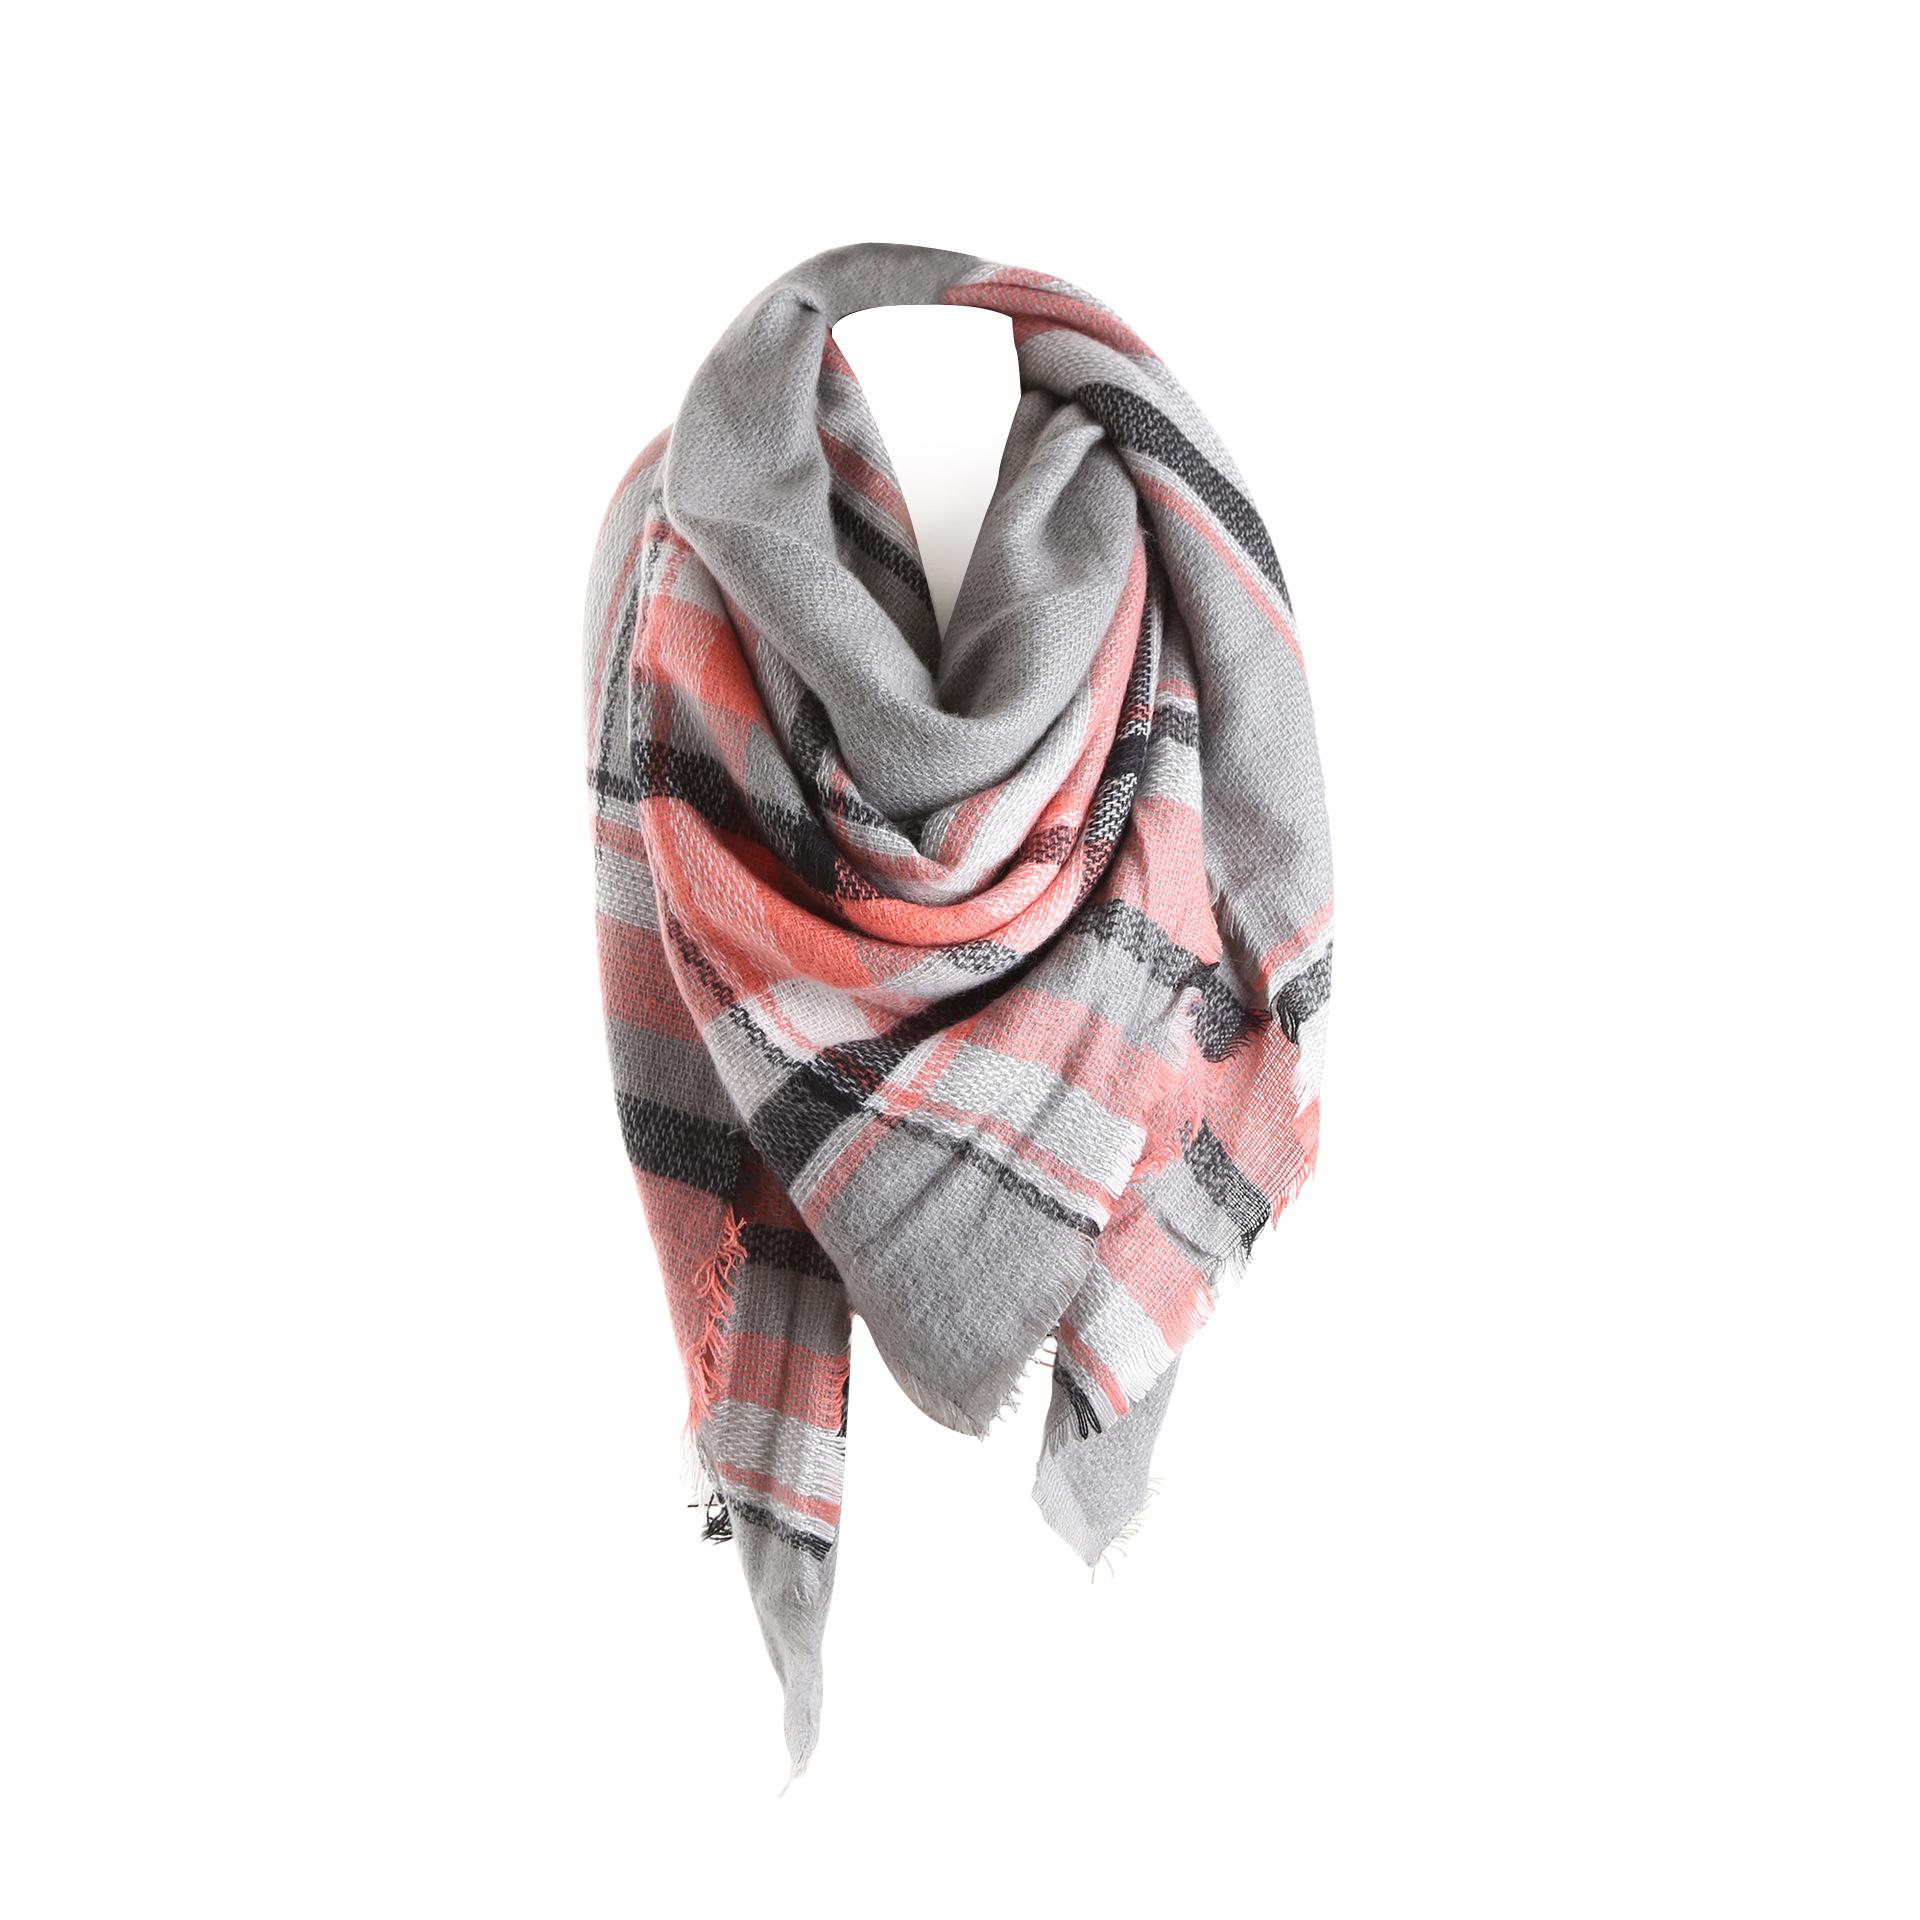 Surblue Women's Plaid Blanket Winter Scarfs for $11.19